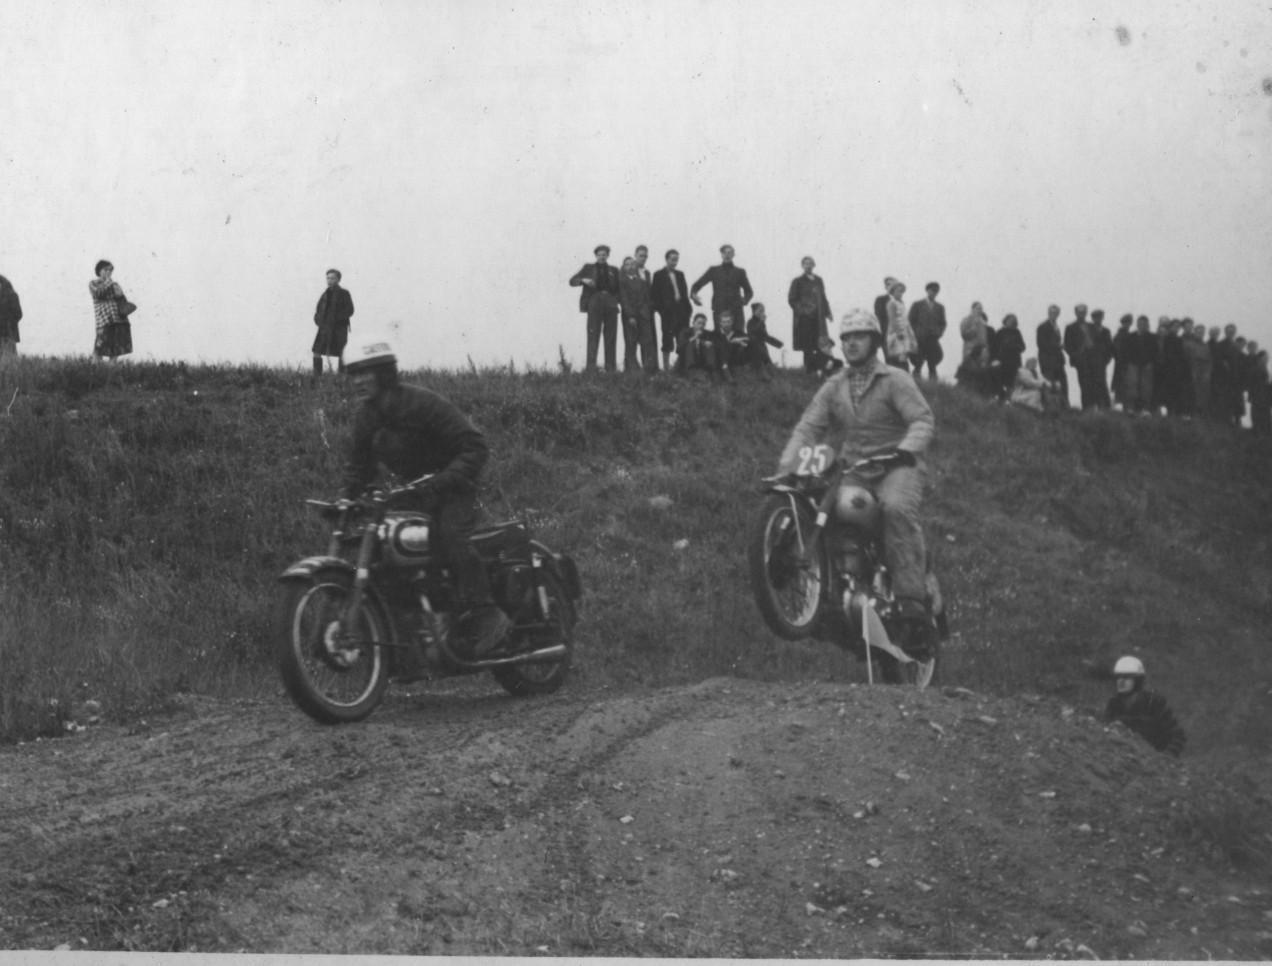 Gunnar Williams foran Knud Nielsen